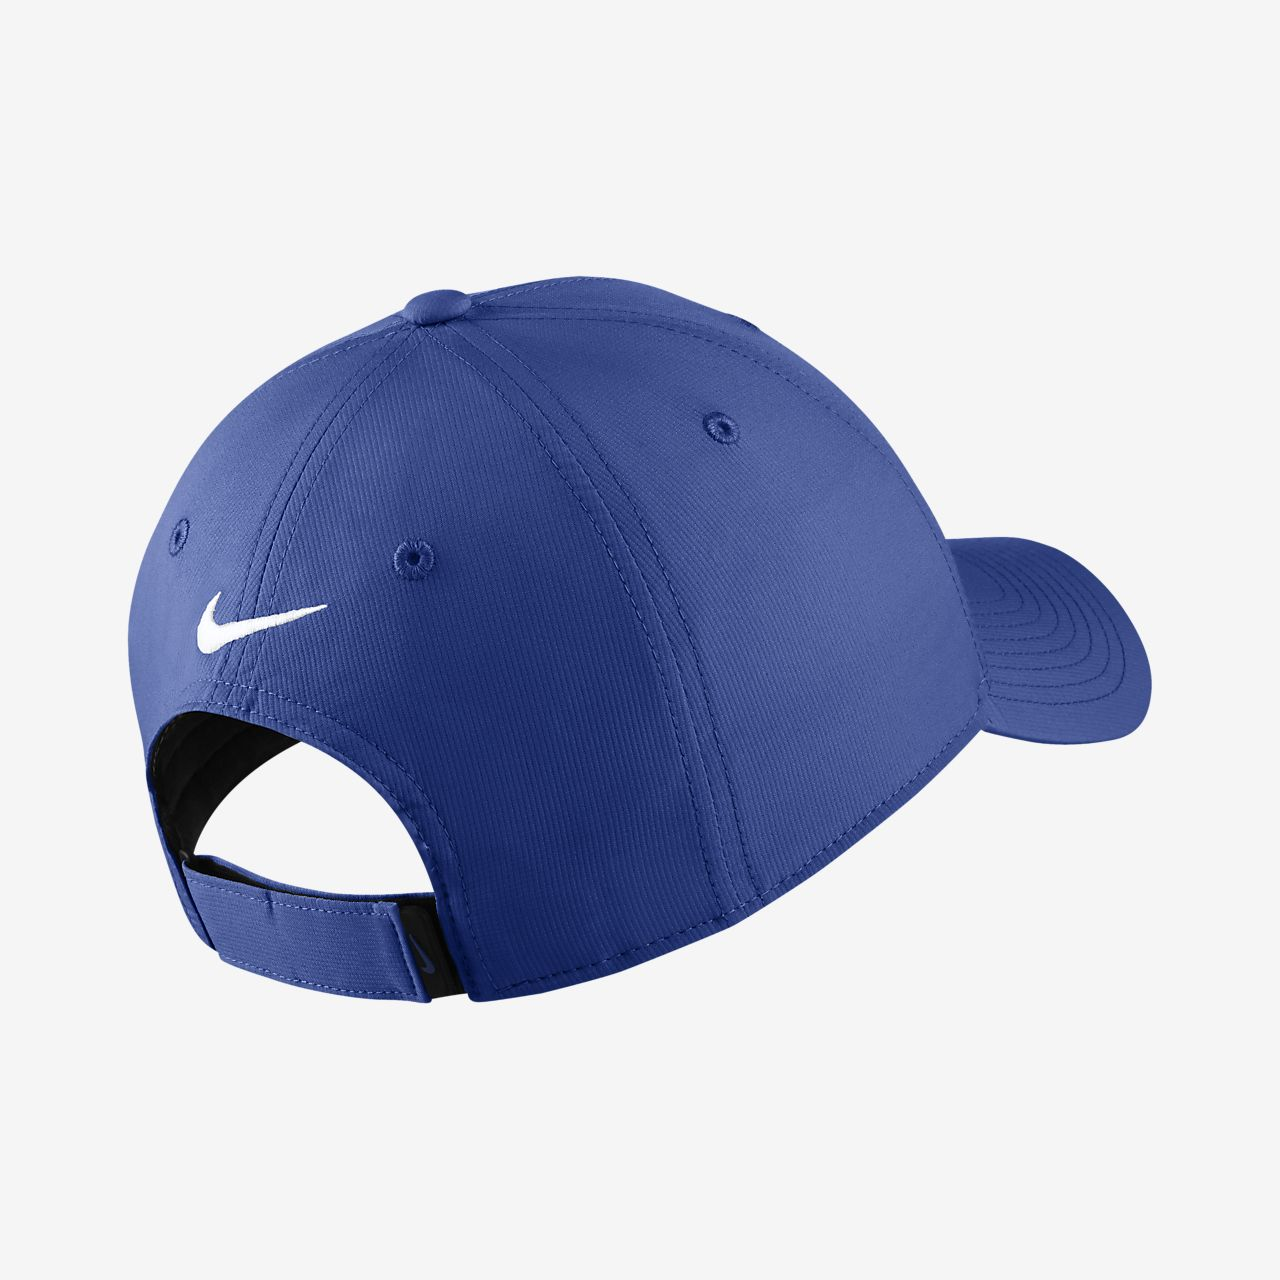 47a56d8334496 Nike Dri-FIT Legacy91 Golf Hat. Nike.com CA